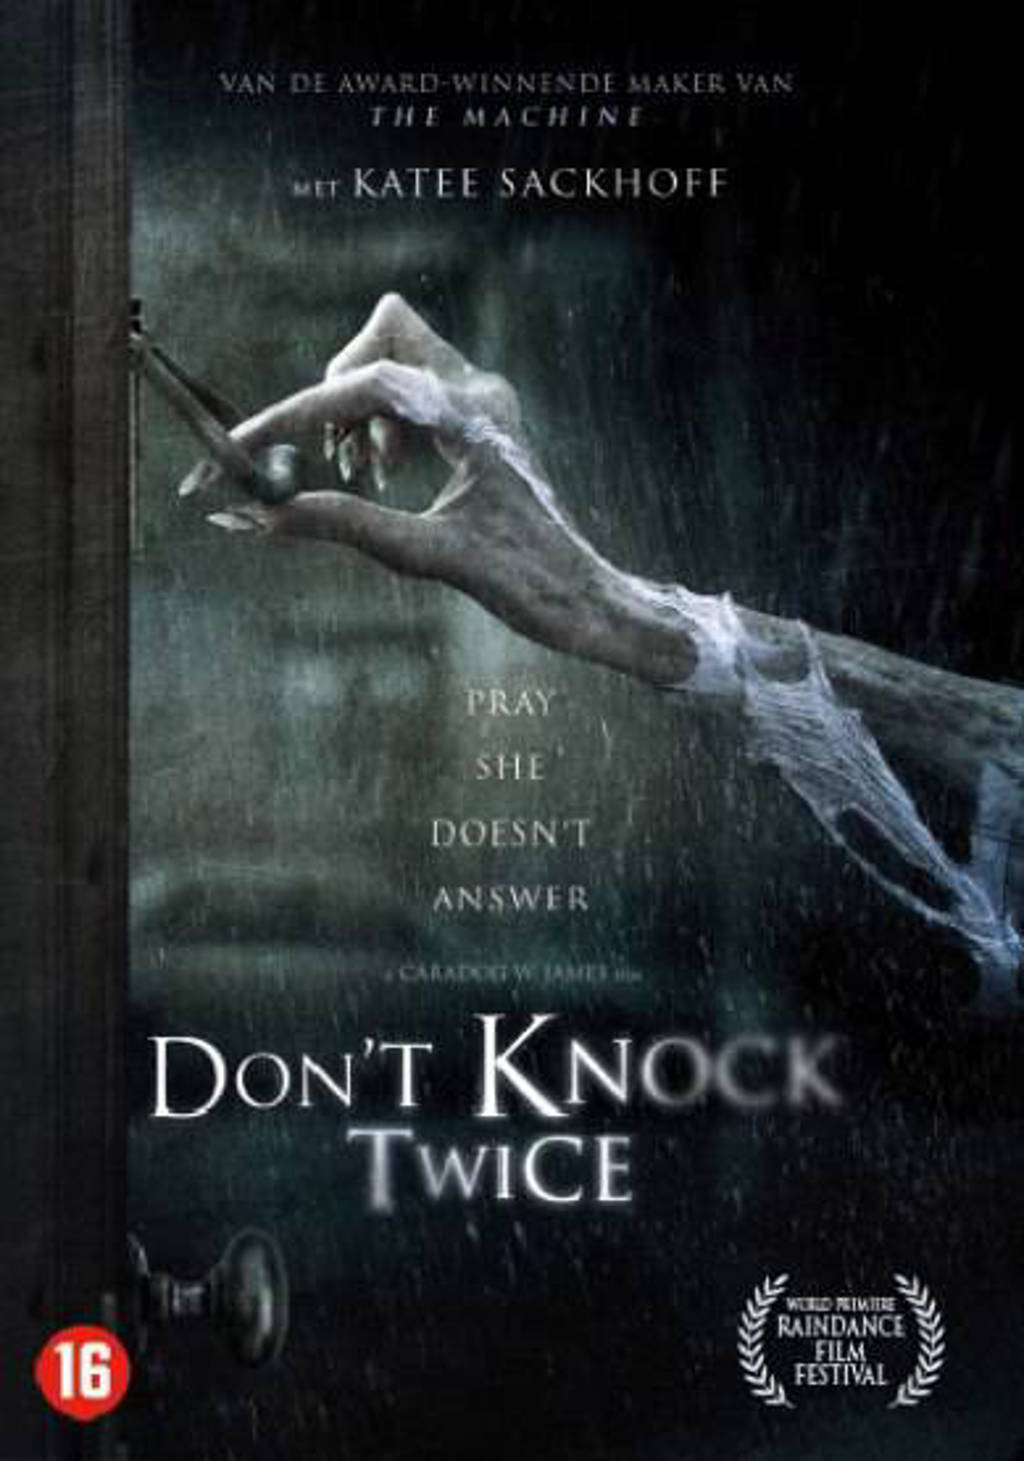 Don't knock twice (DVD)